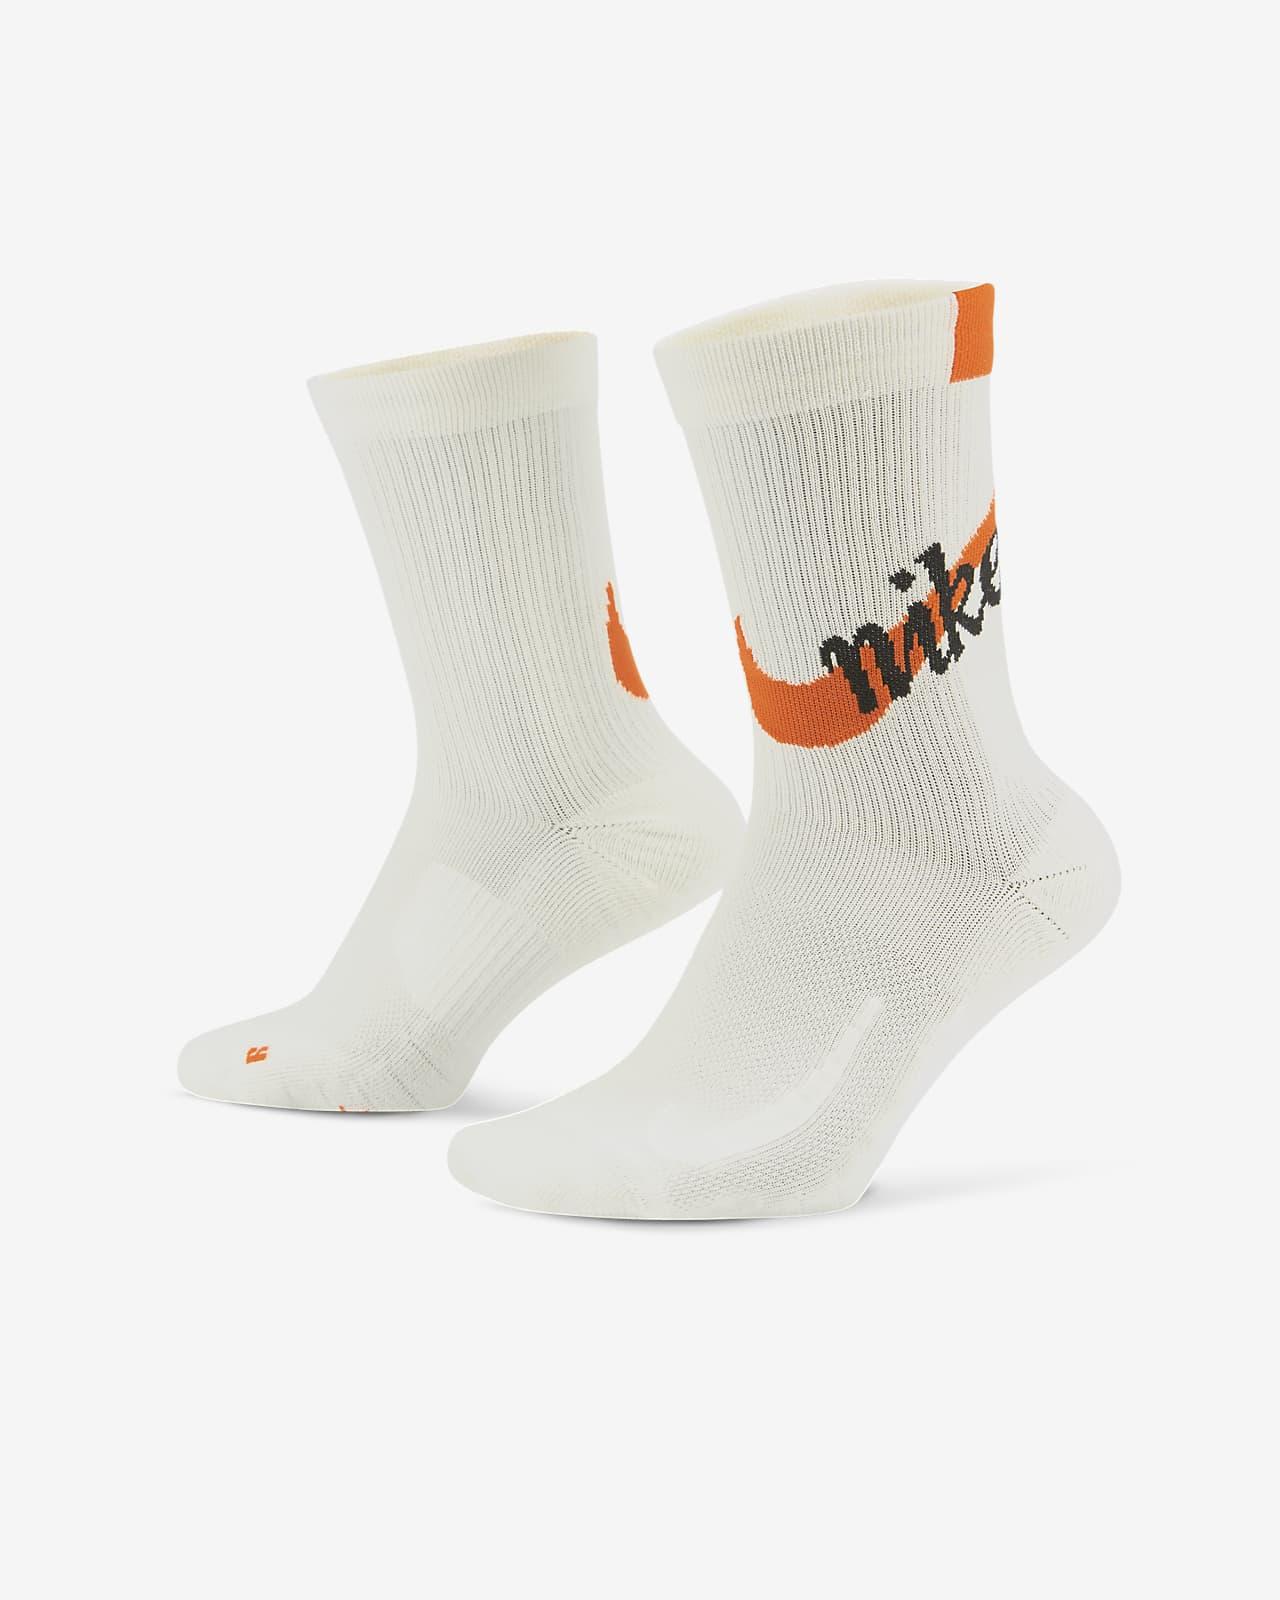 Chaussettes de running mi-mollet Nike Multiplier